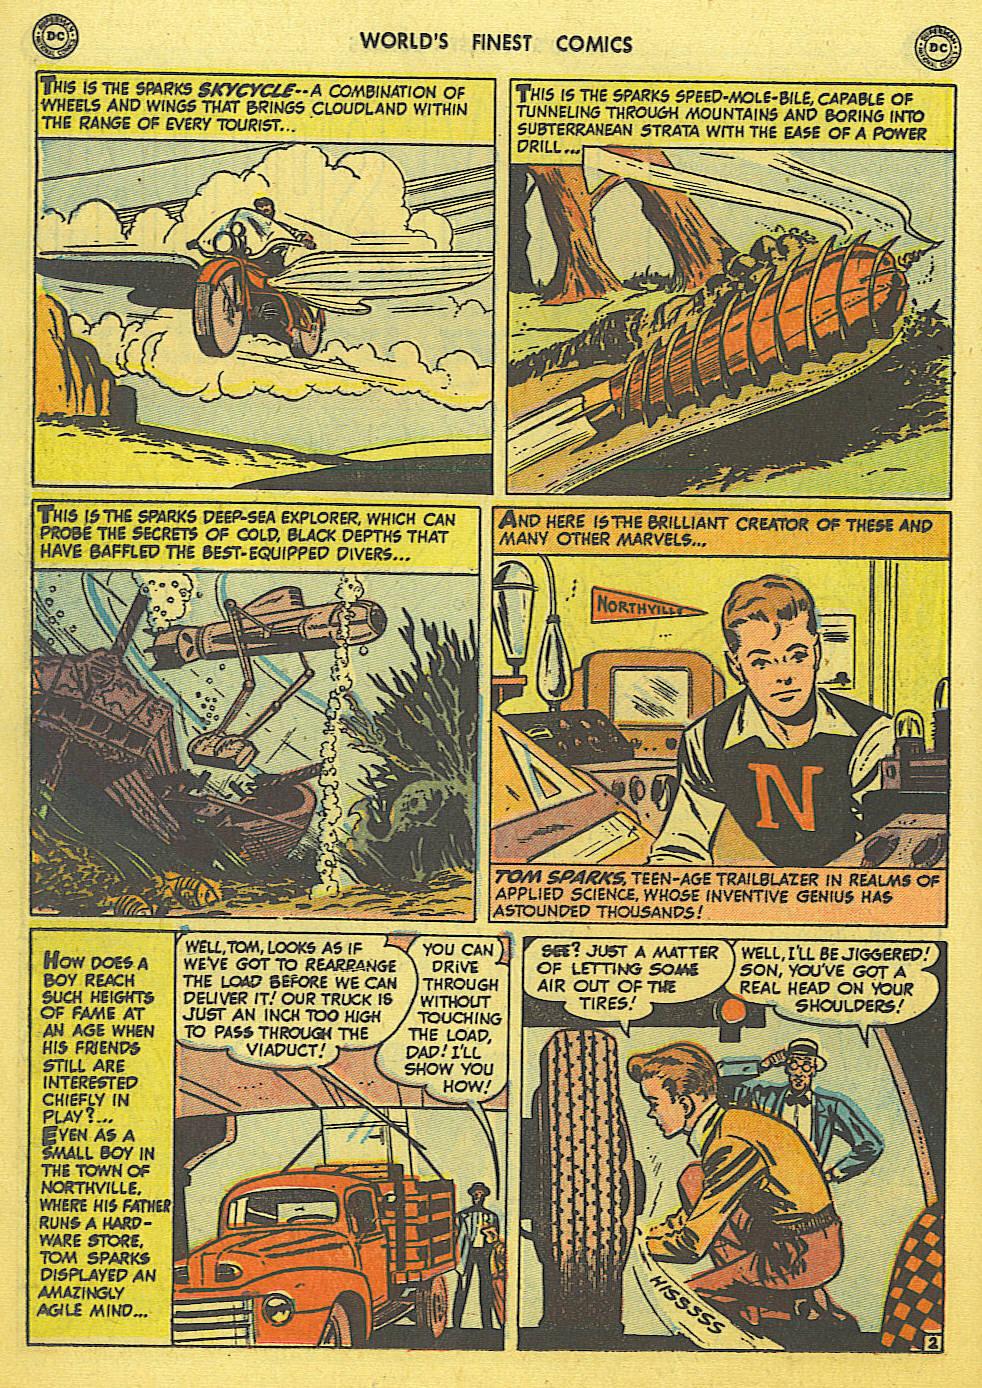 Read online World's Finest Comics comic -  Issue #49 - 31